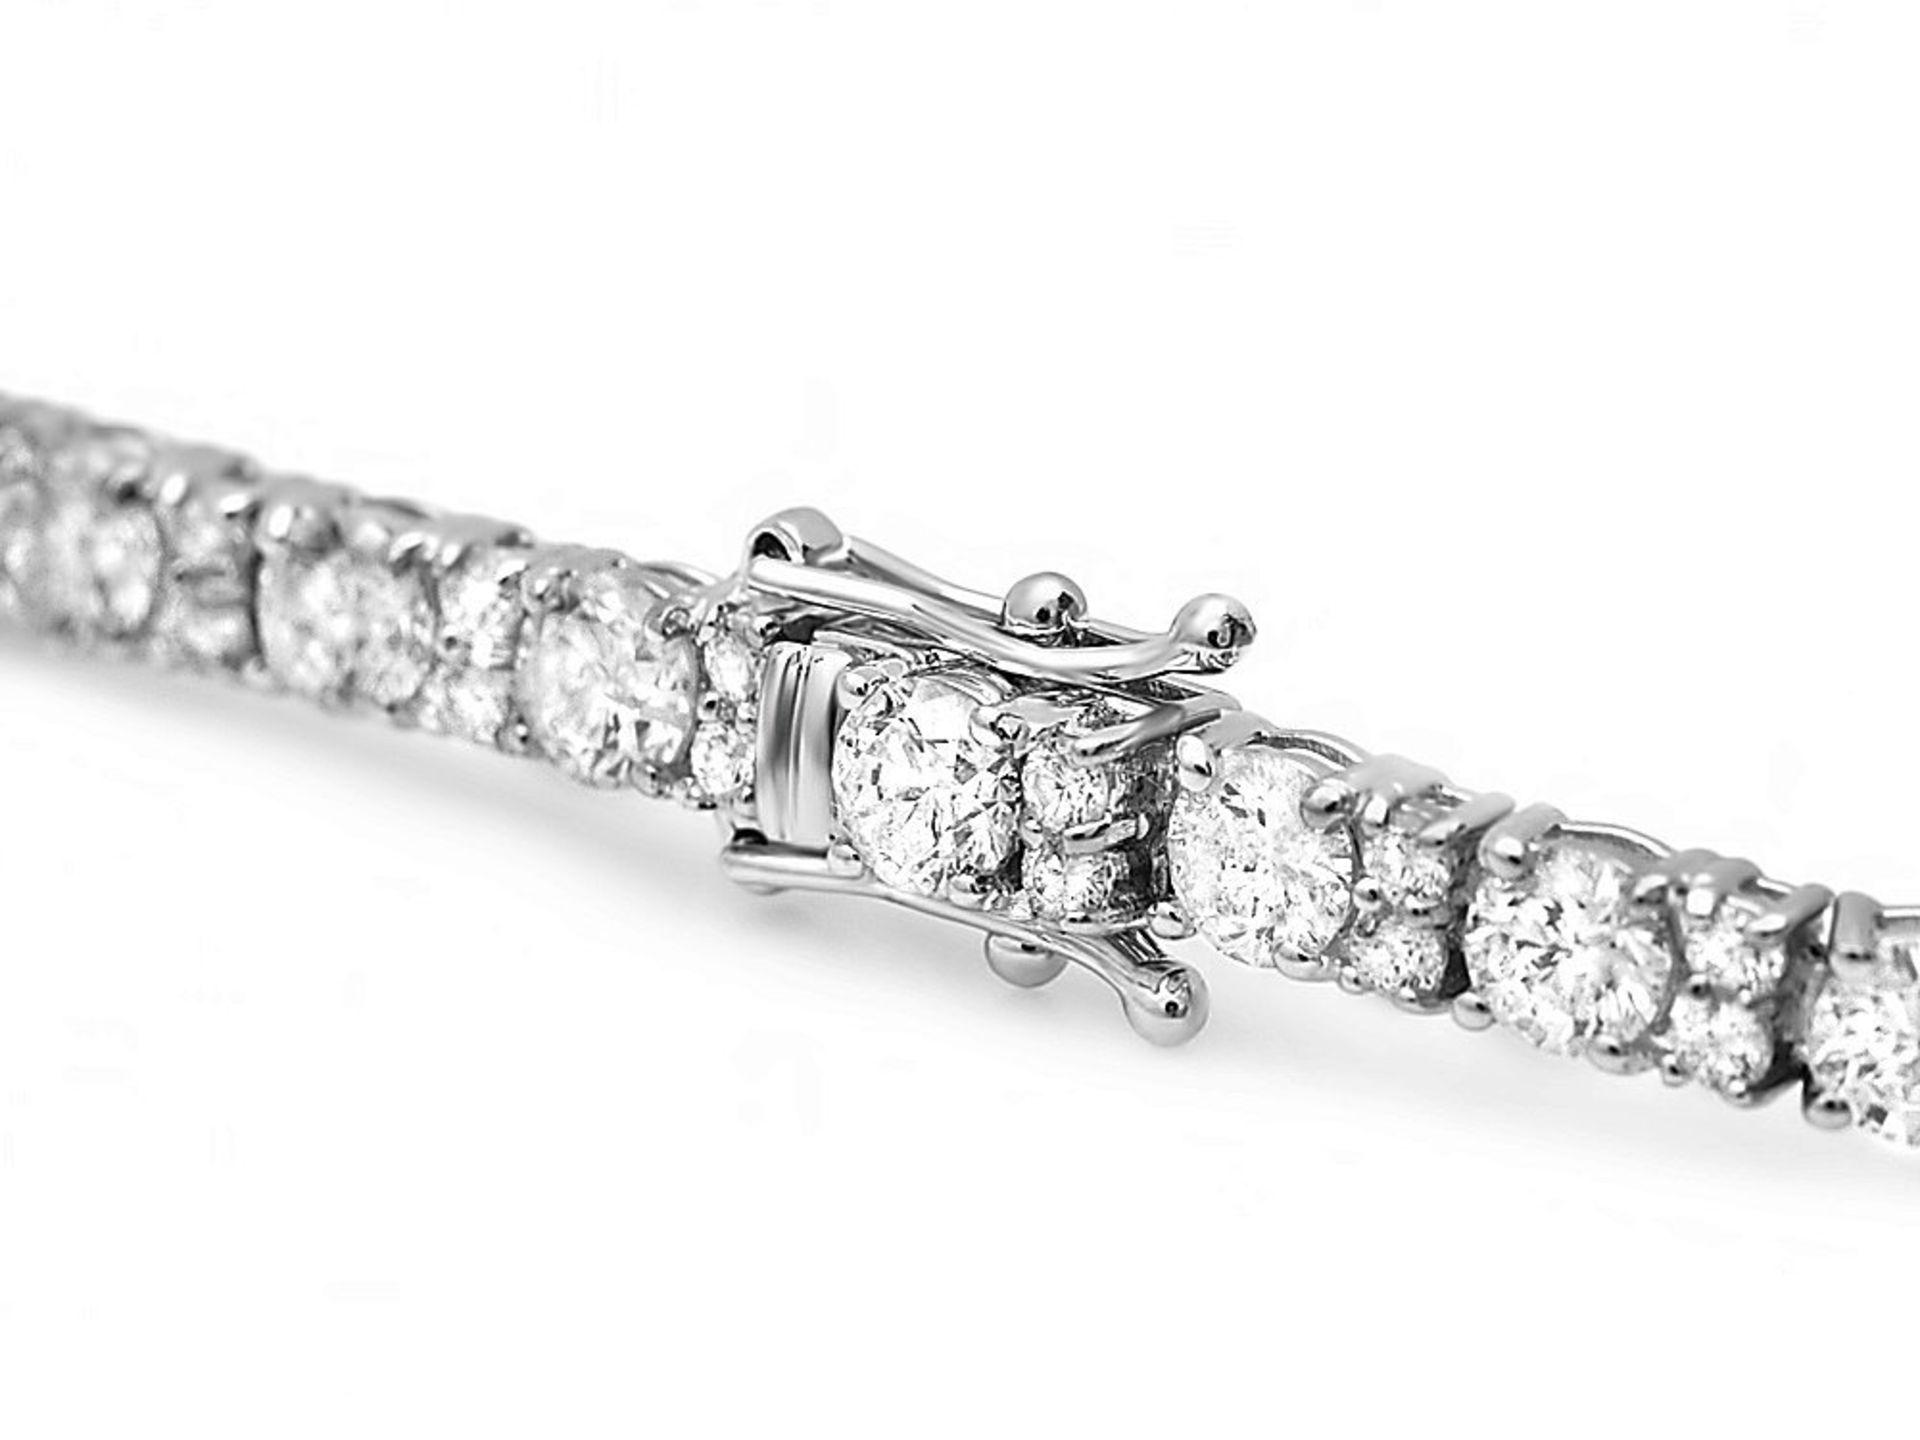 18k White Gold 9.00ct Diamond Bracelet - Image 3 of 4